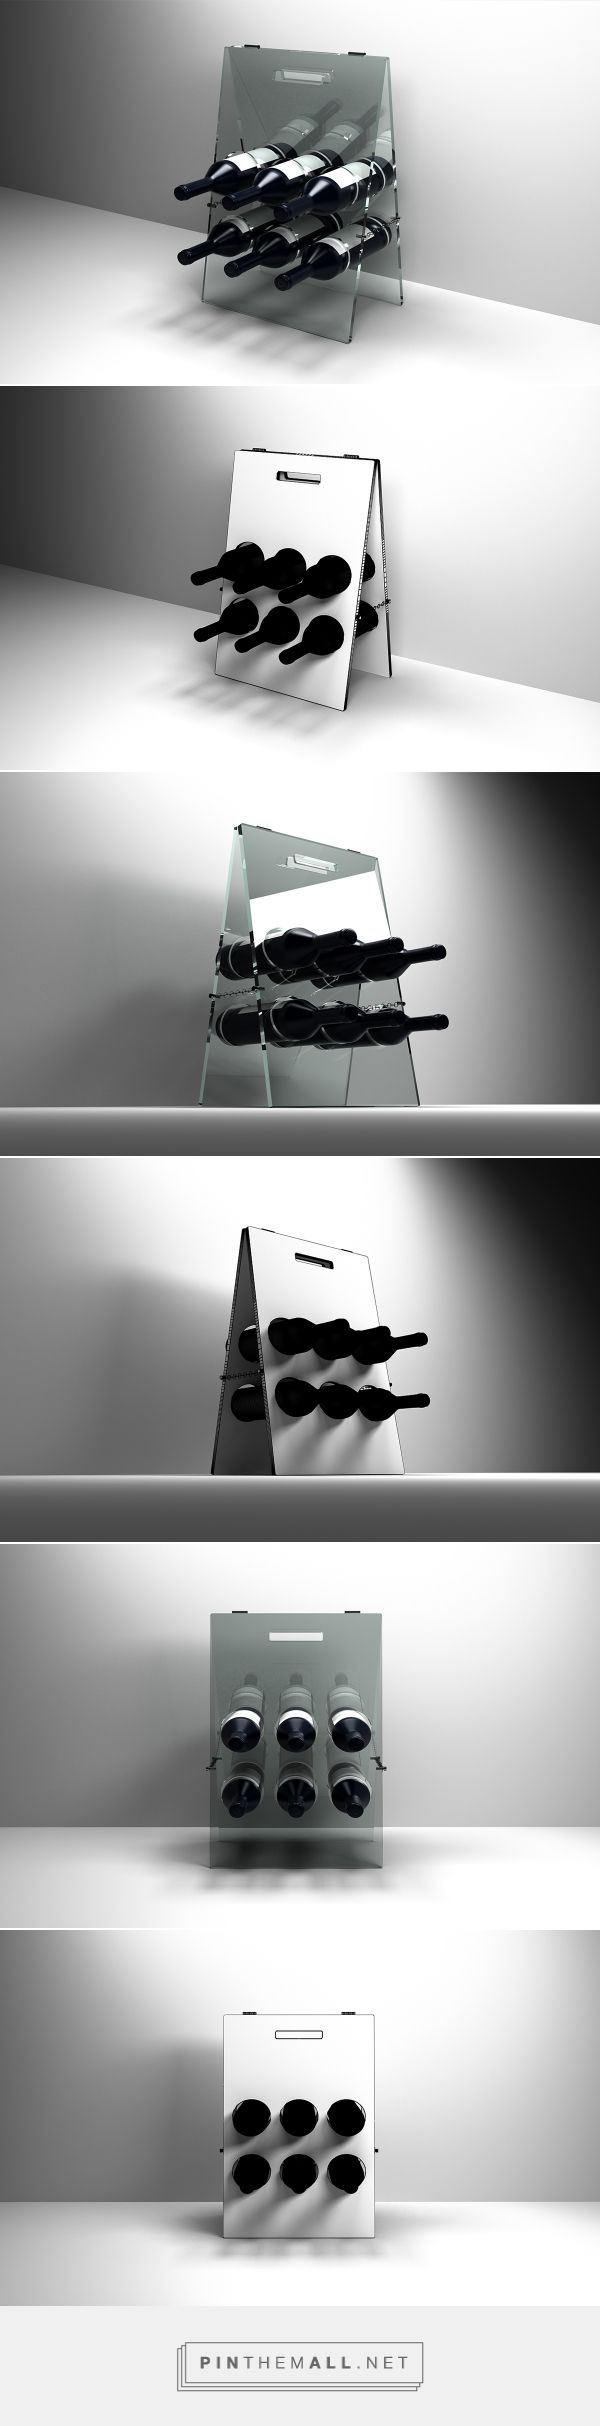 Expositor para garrafas de vinho/Wine bottles display by Tiago Nogueira